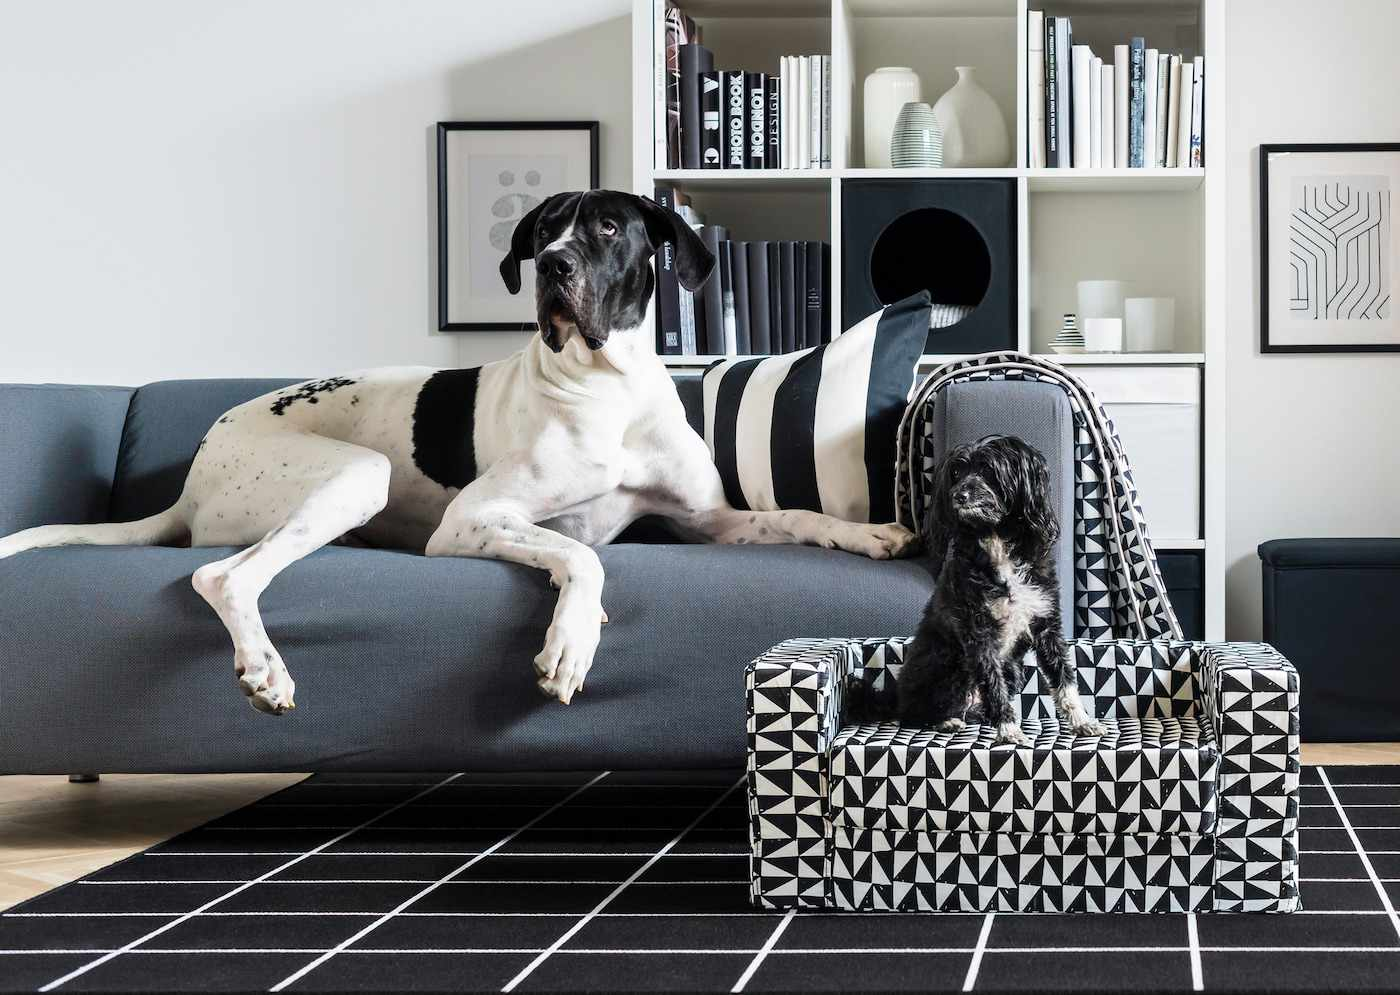 IKEA LURVIG Cat and Dog Furniture Line Best Products on dog food furniture, dog home decorations, dog jewelry, dog houses, dog home art, dog glass furniture, cat furniture, dog home decor, dog curtains, dog wardrobe, dog chairs, dog bathroom, dog pharmacy, dog home security, dog design, dog bed furniture, dog home accessories,